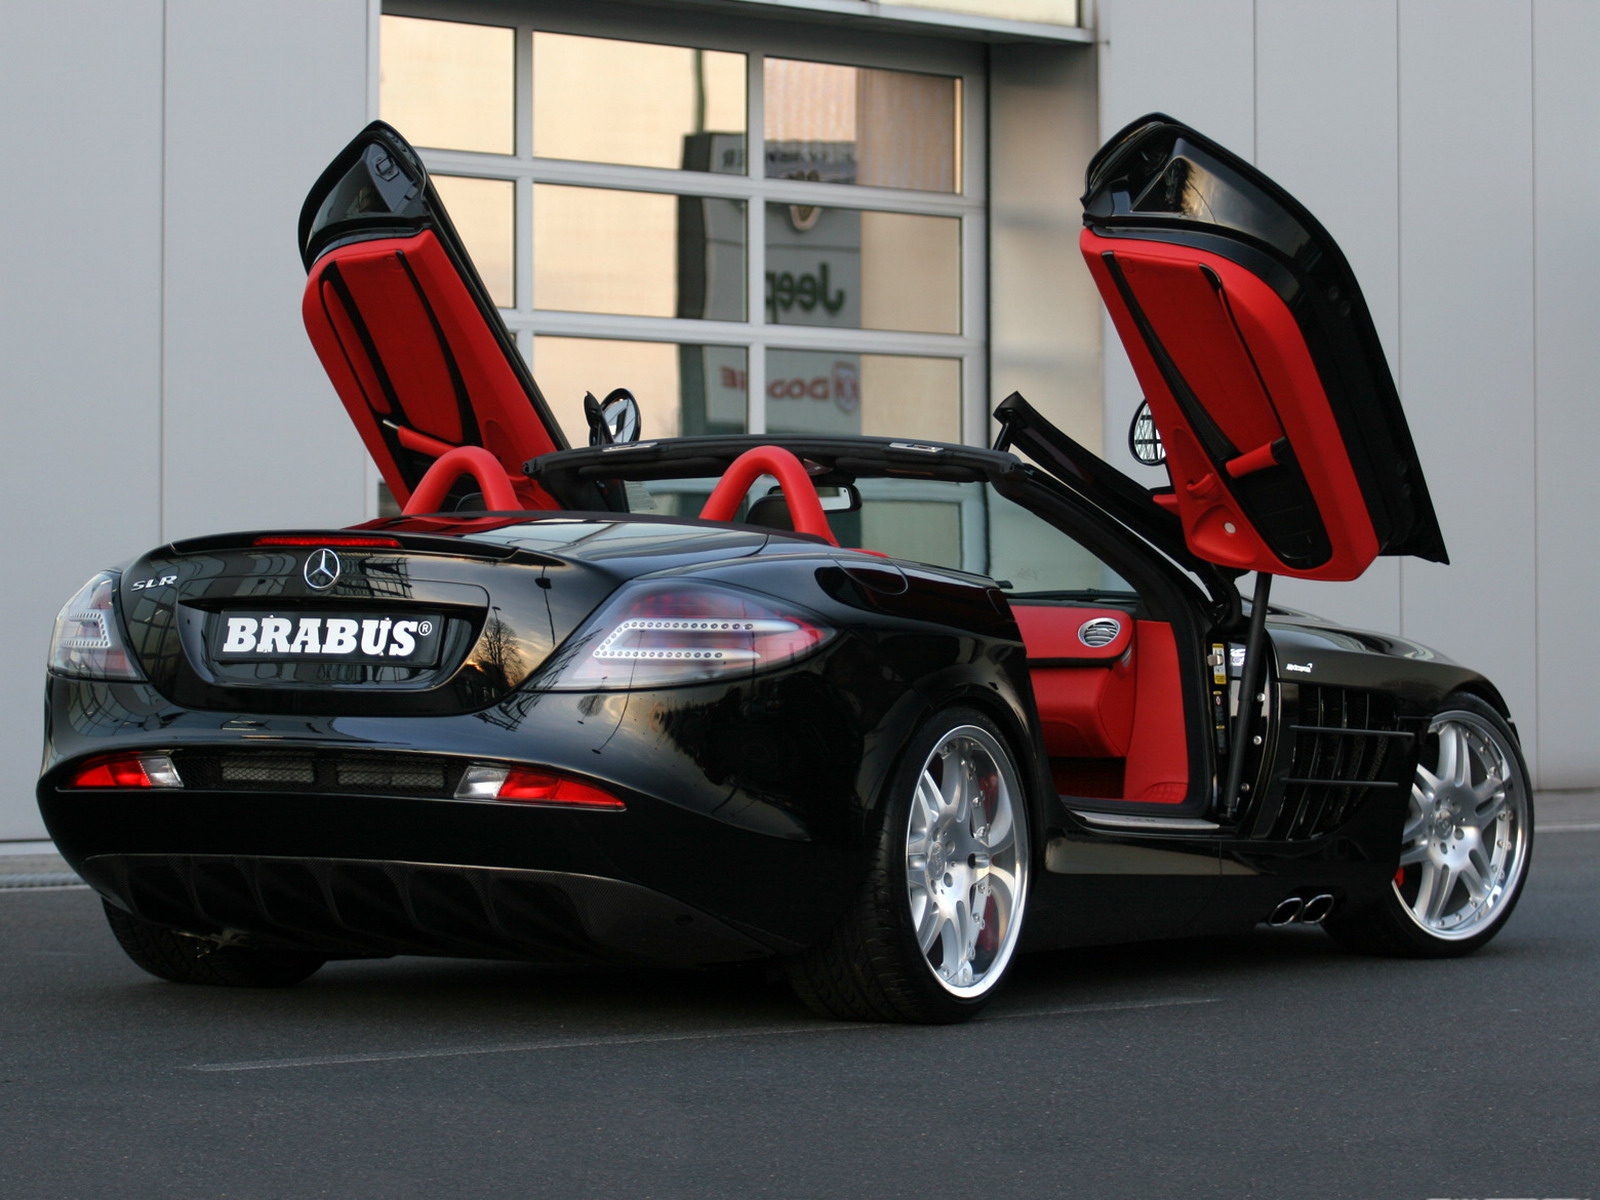 http://2.bp.blogspot.com/-AQ0uNcW-D3U/T47UBztXWuI/AAAAAAAAAI4/COA-zkxyF6k/s1600/brabus_mercedes-benz_slr_mclaren_roadster_2.jpg